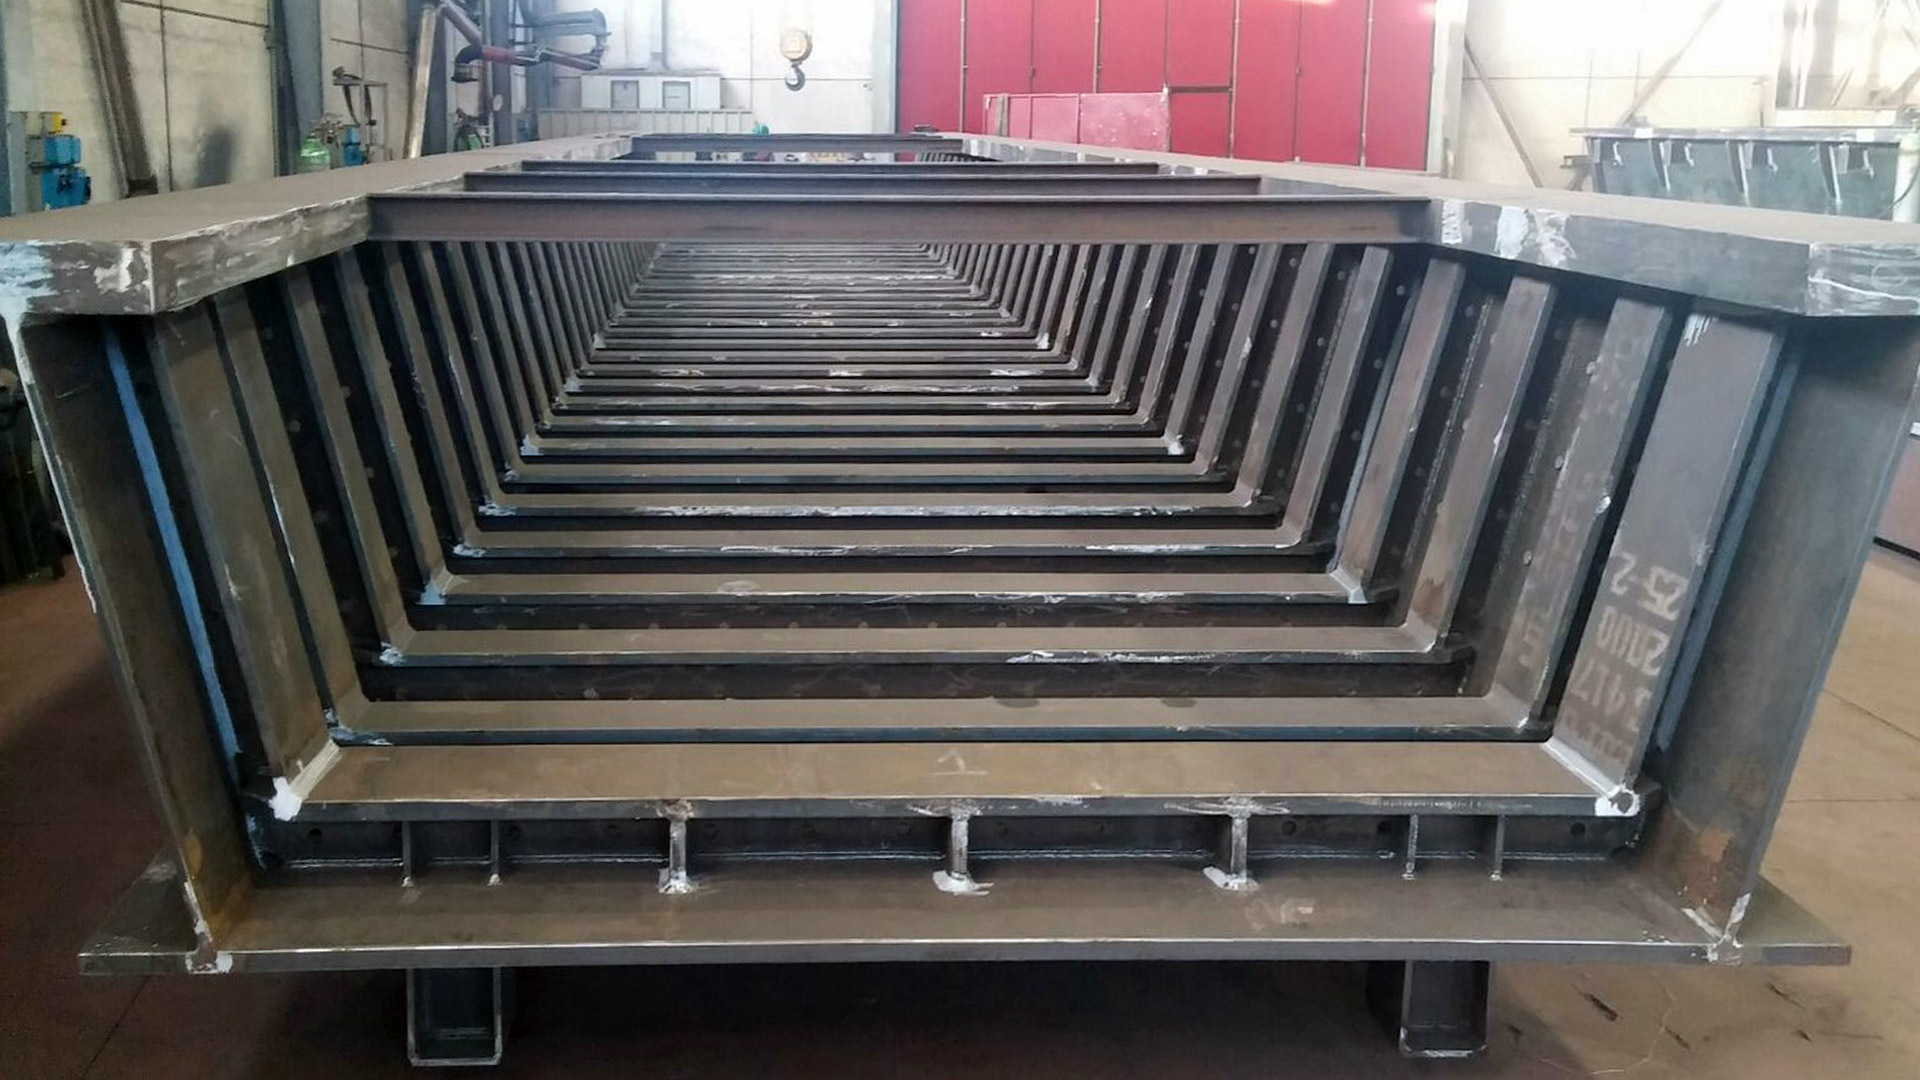 rio-borghetto-ponte-vista-frontale-carpenteria-civile-metal-engineering